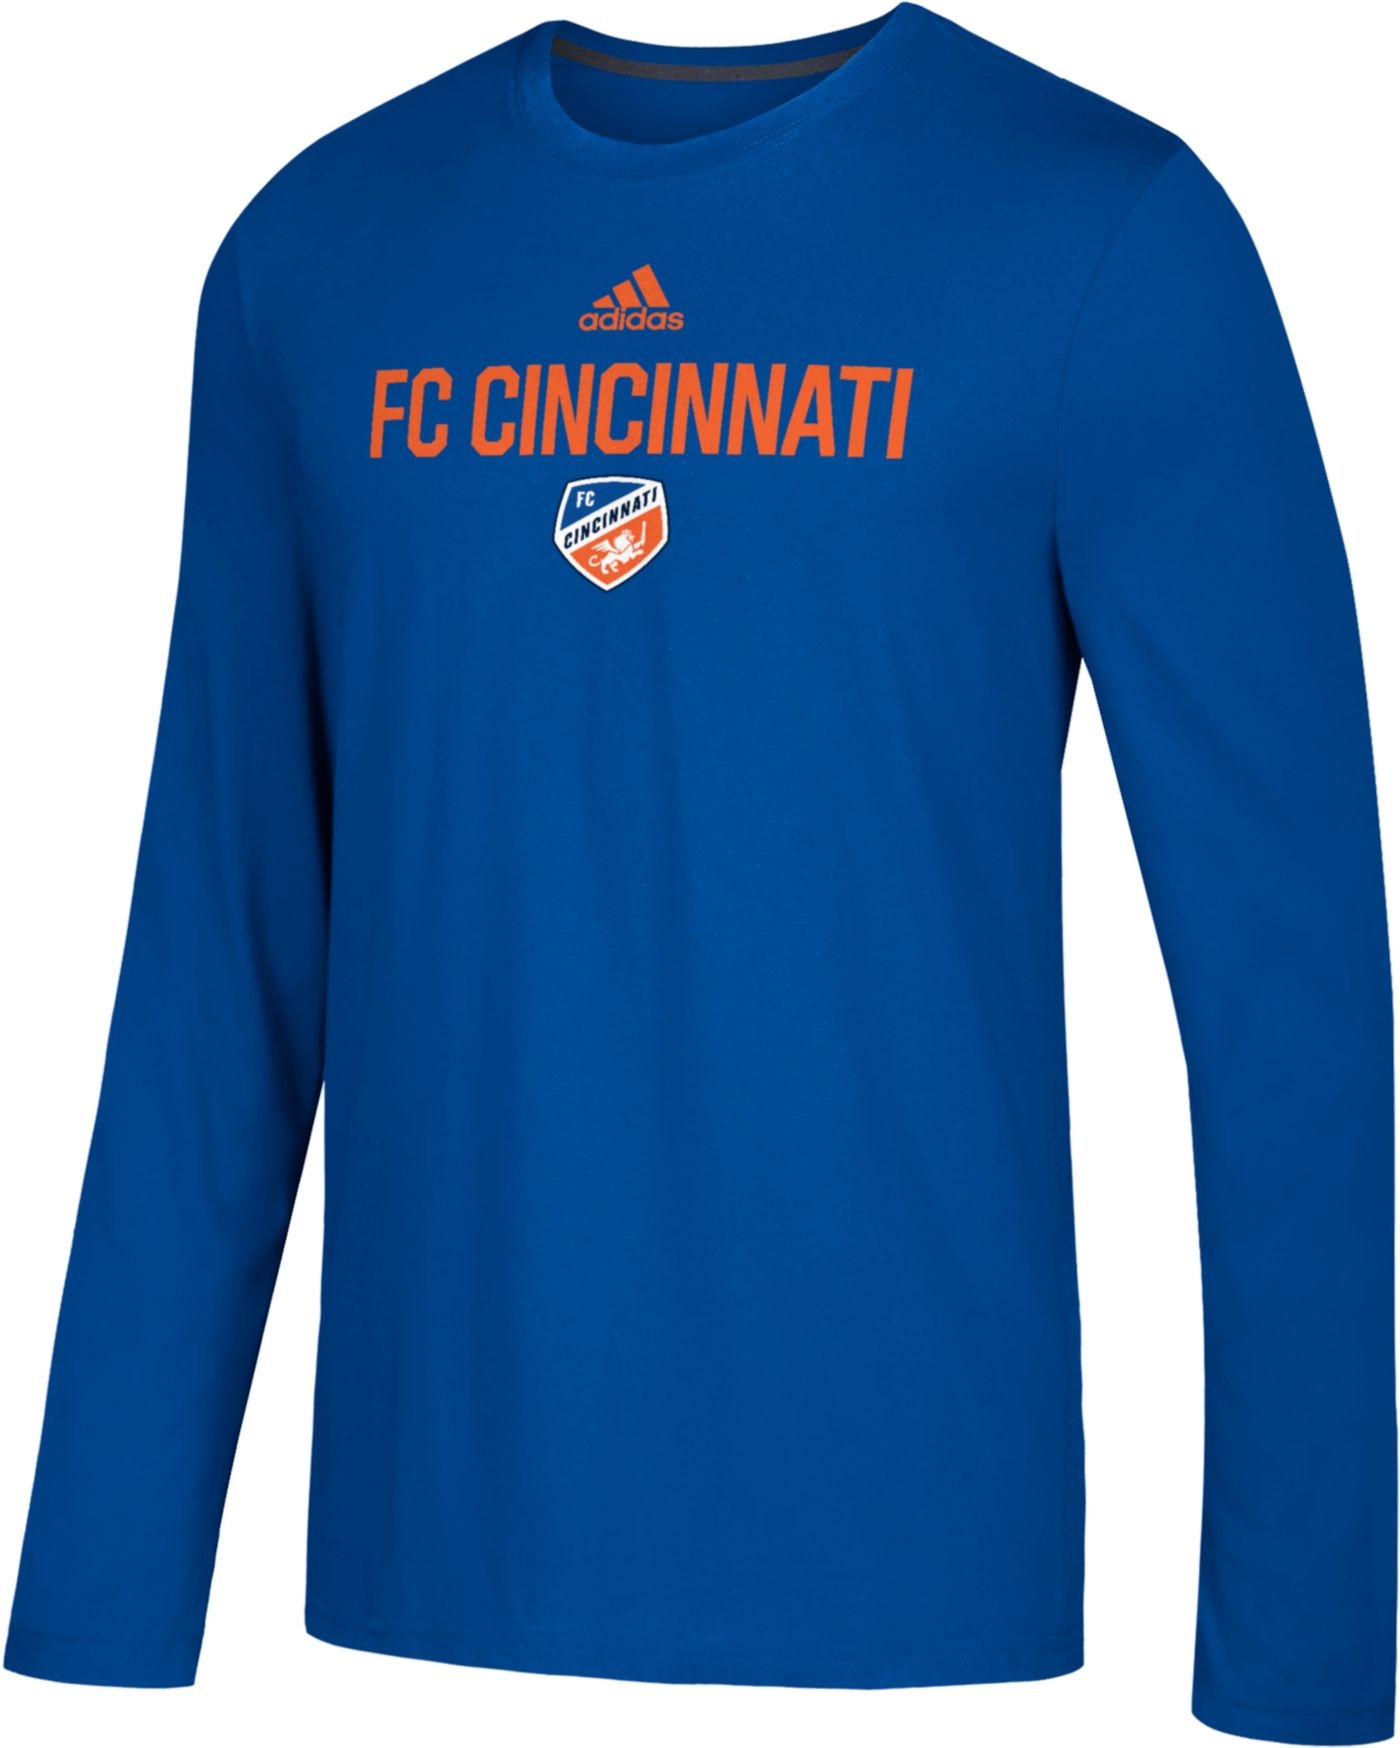 adidas Men's FC Cincinnati Logo Performance Royal Long Sleeve Shirt